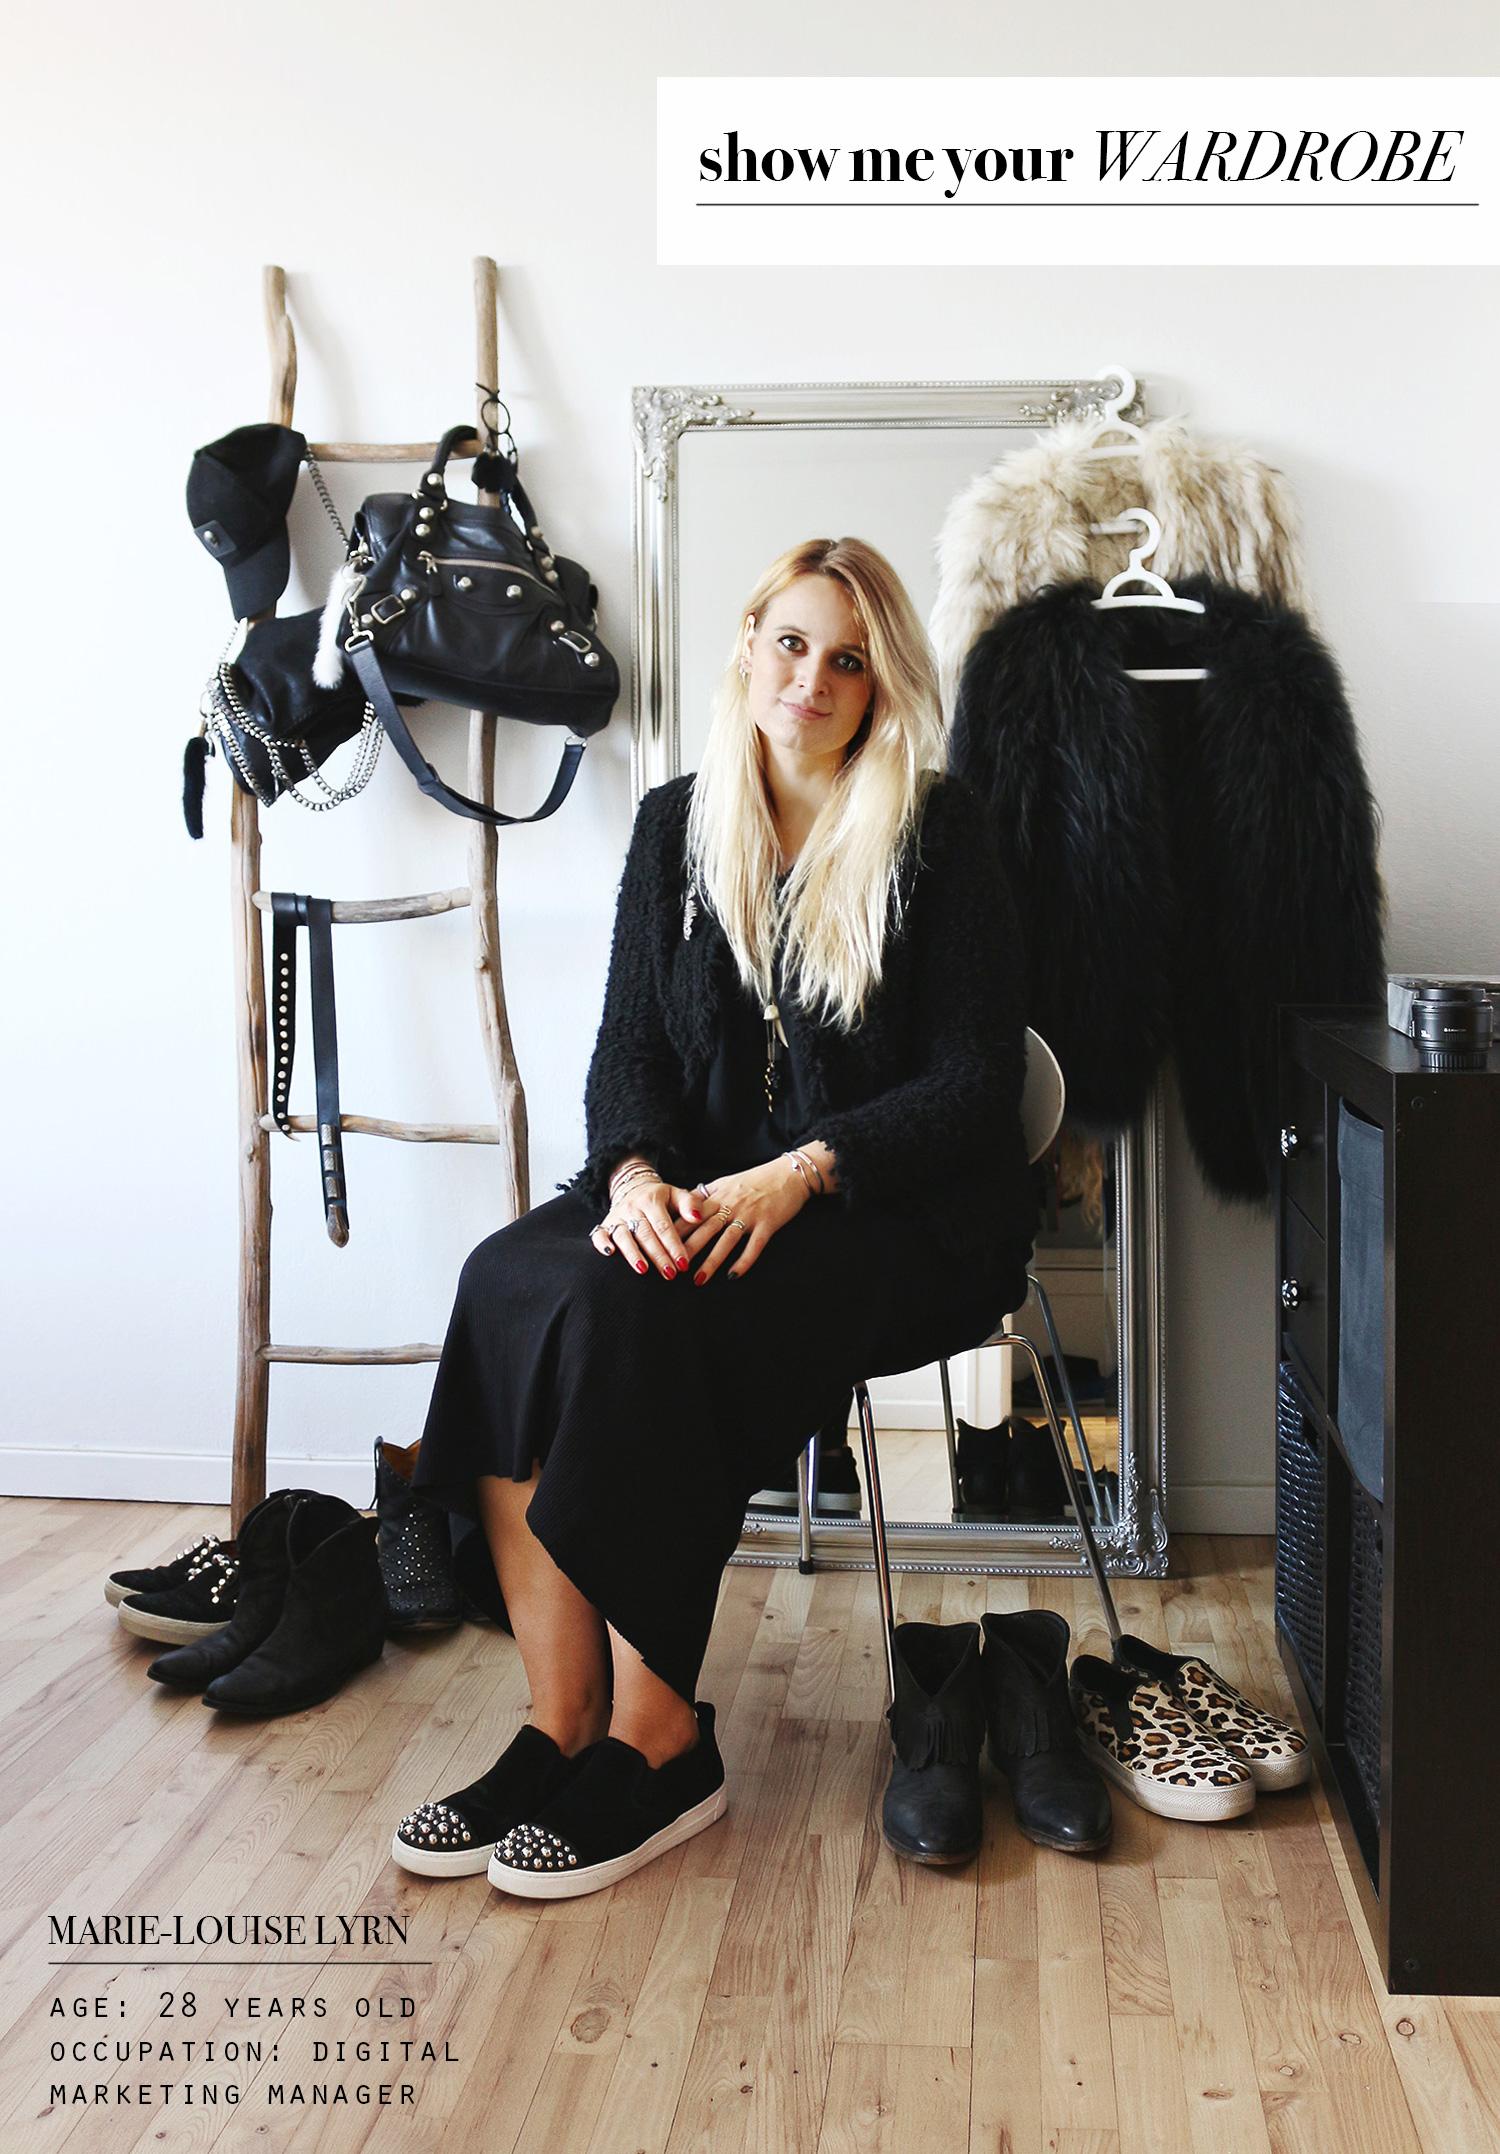 show-me-your-wardrobe-garderobe@2x